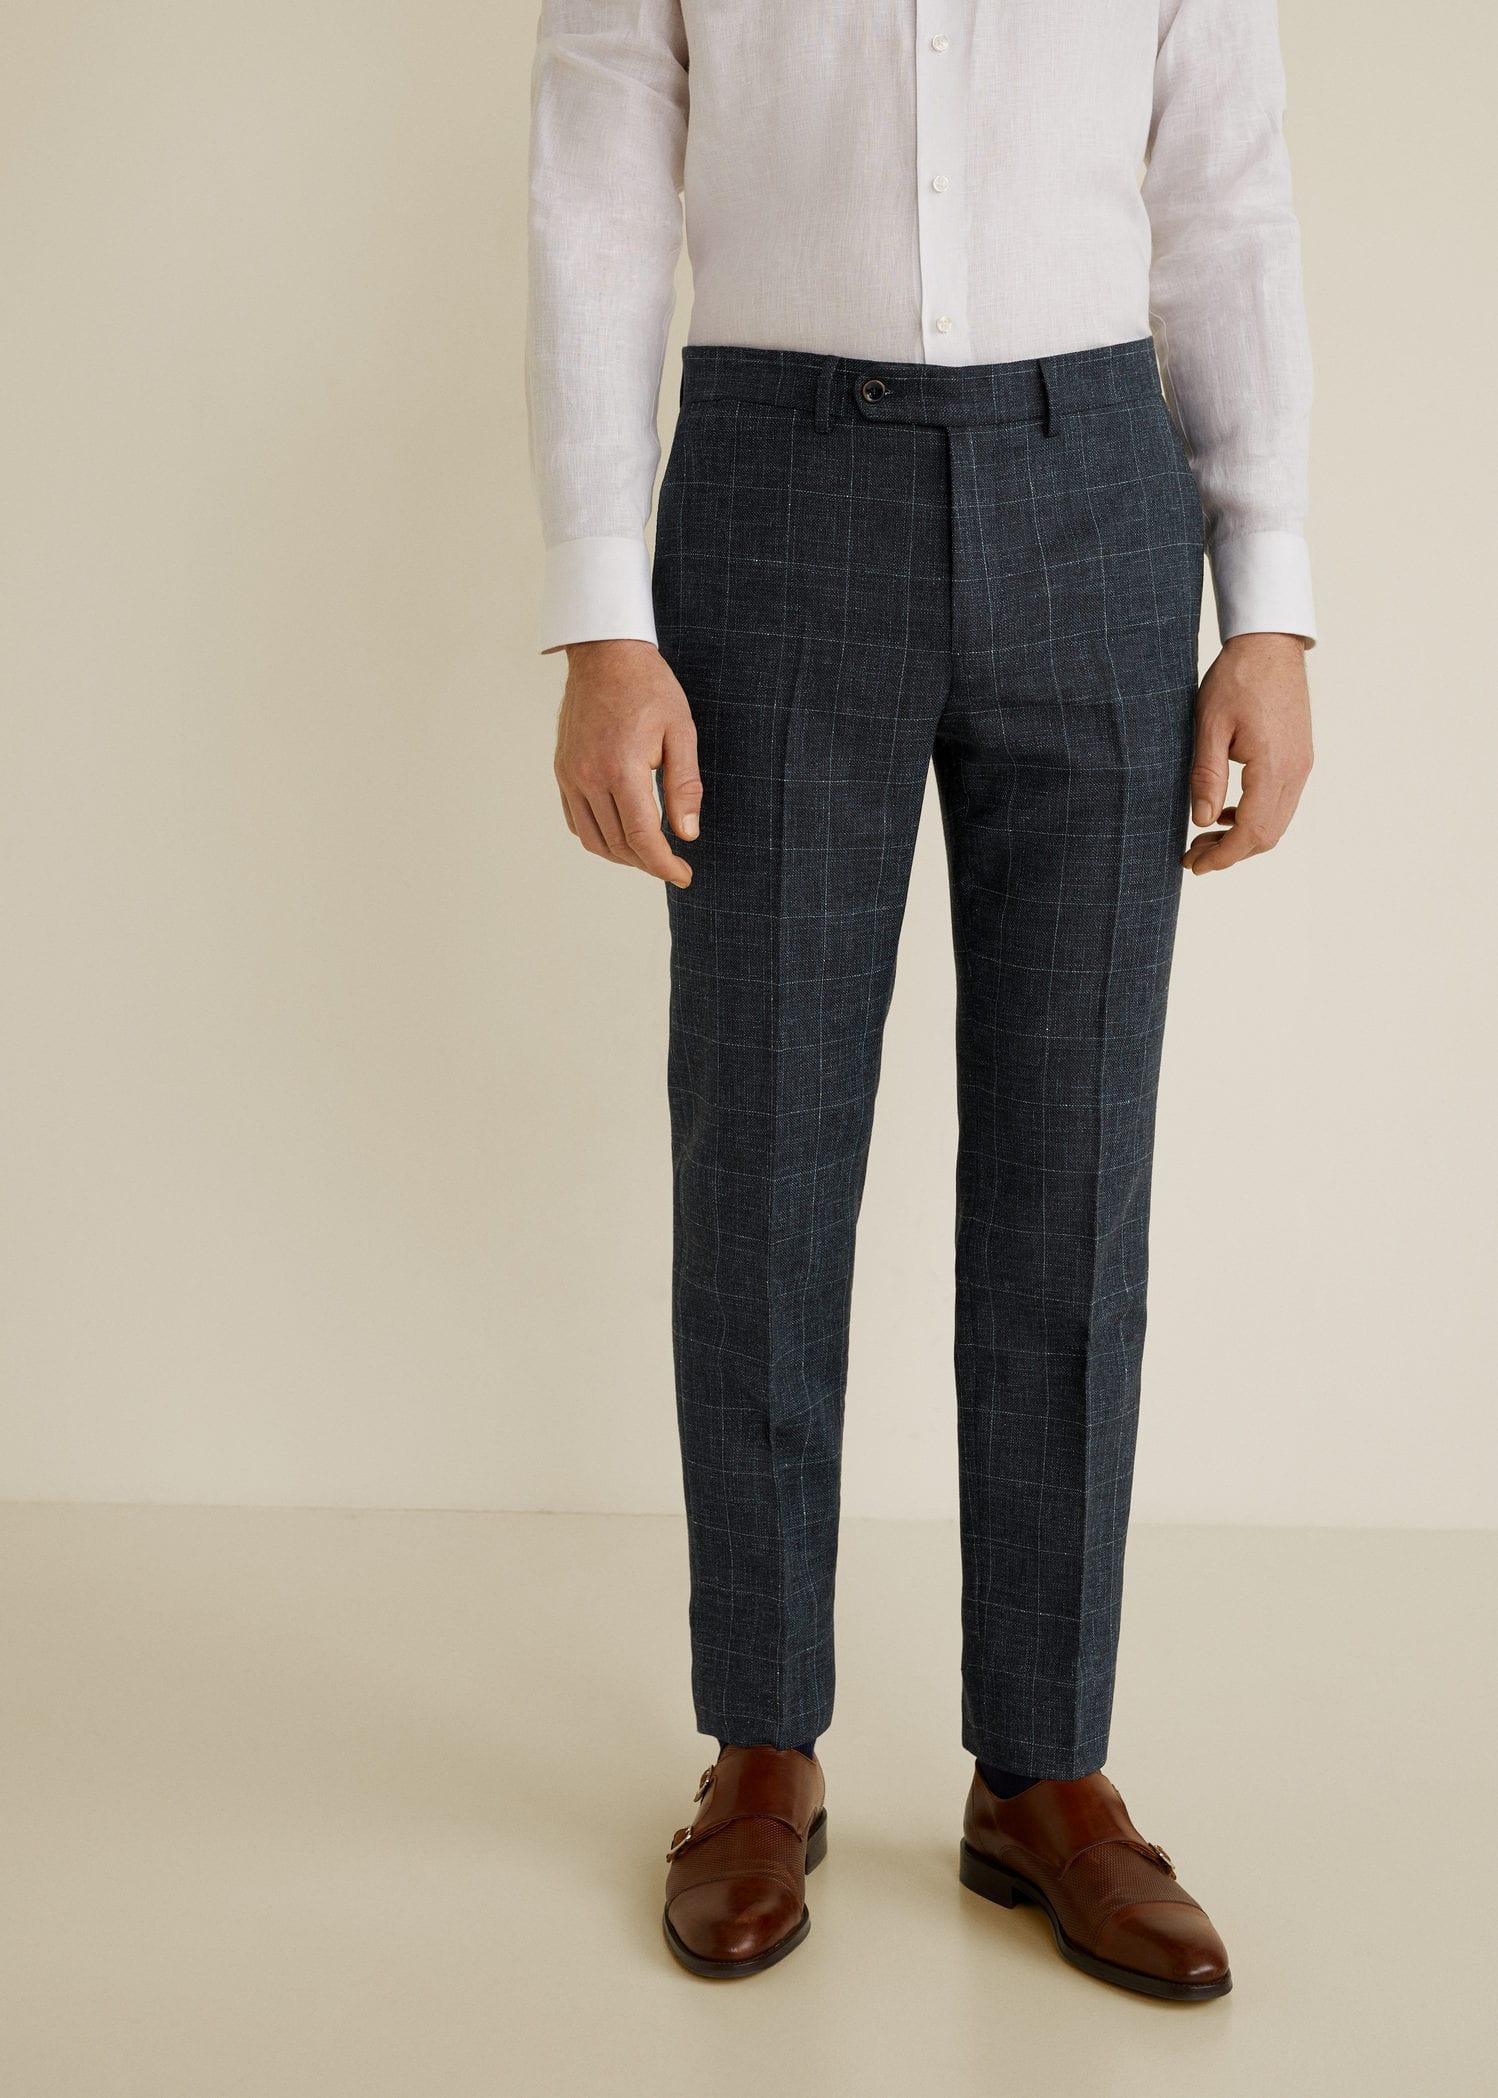 Pantalón traje slim-fit lana virgen - Trajes de Hombre  91455978ff7